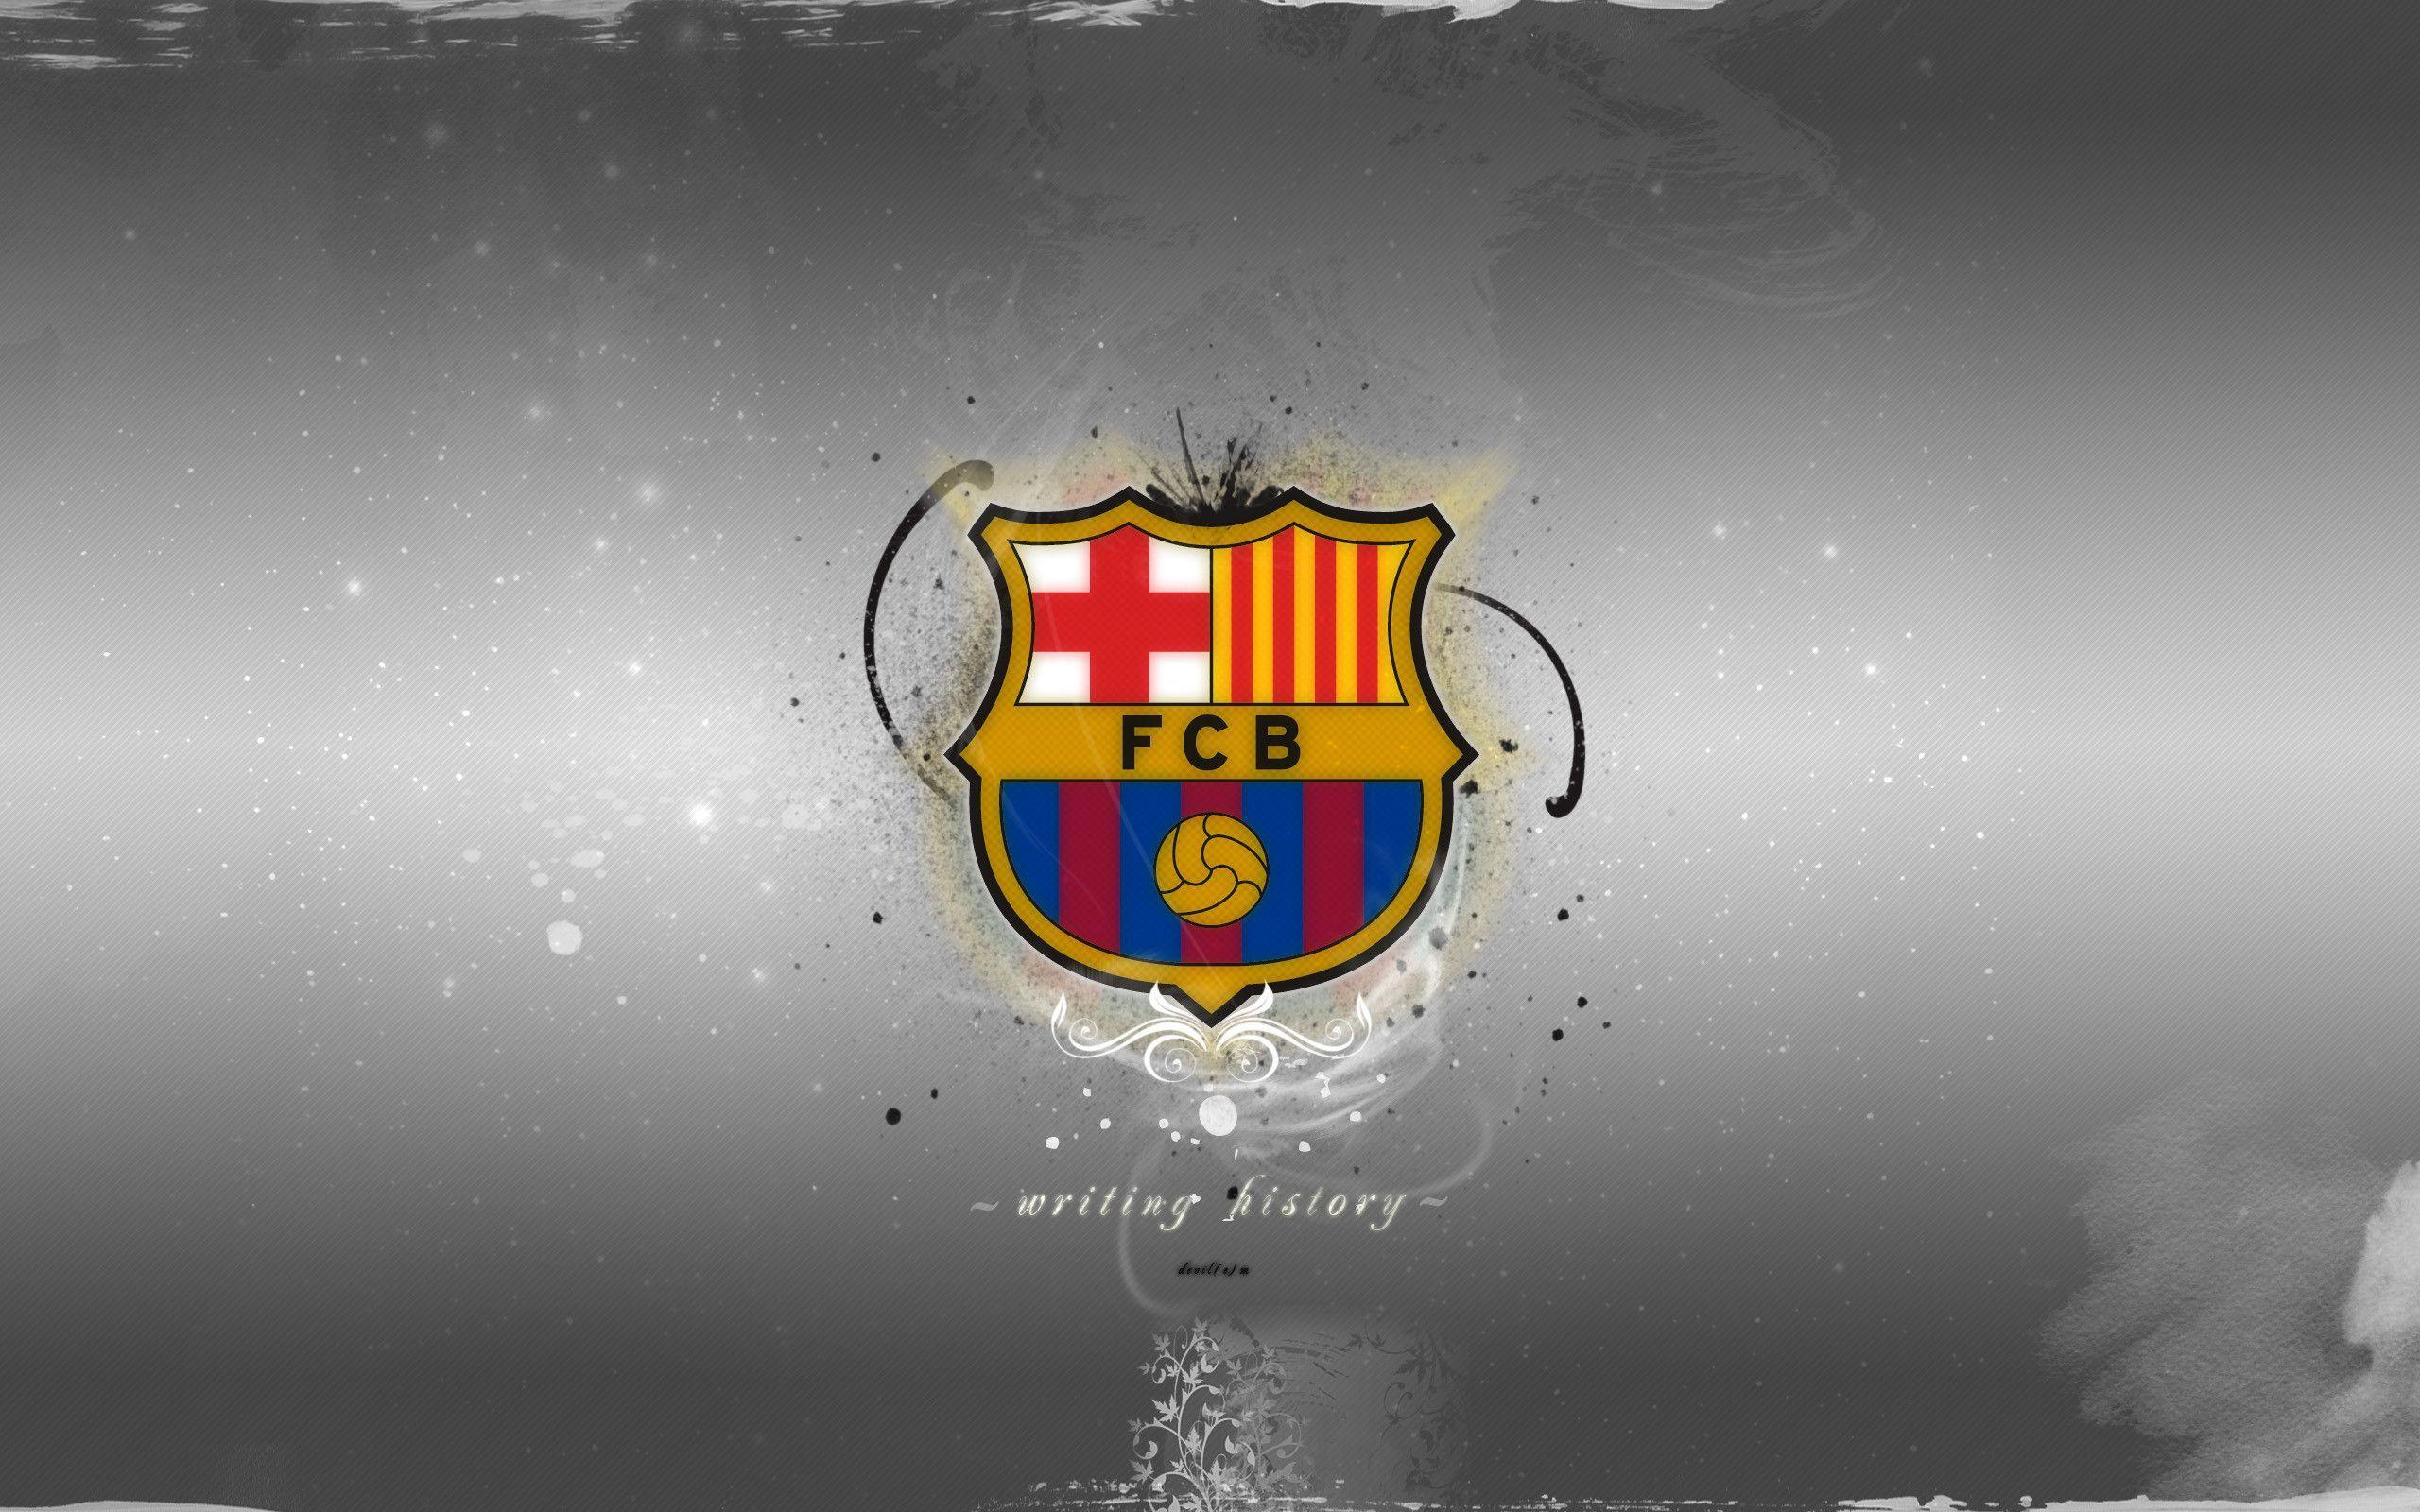 Barca Wallpapers - Wallpaper Cave